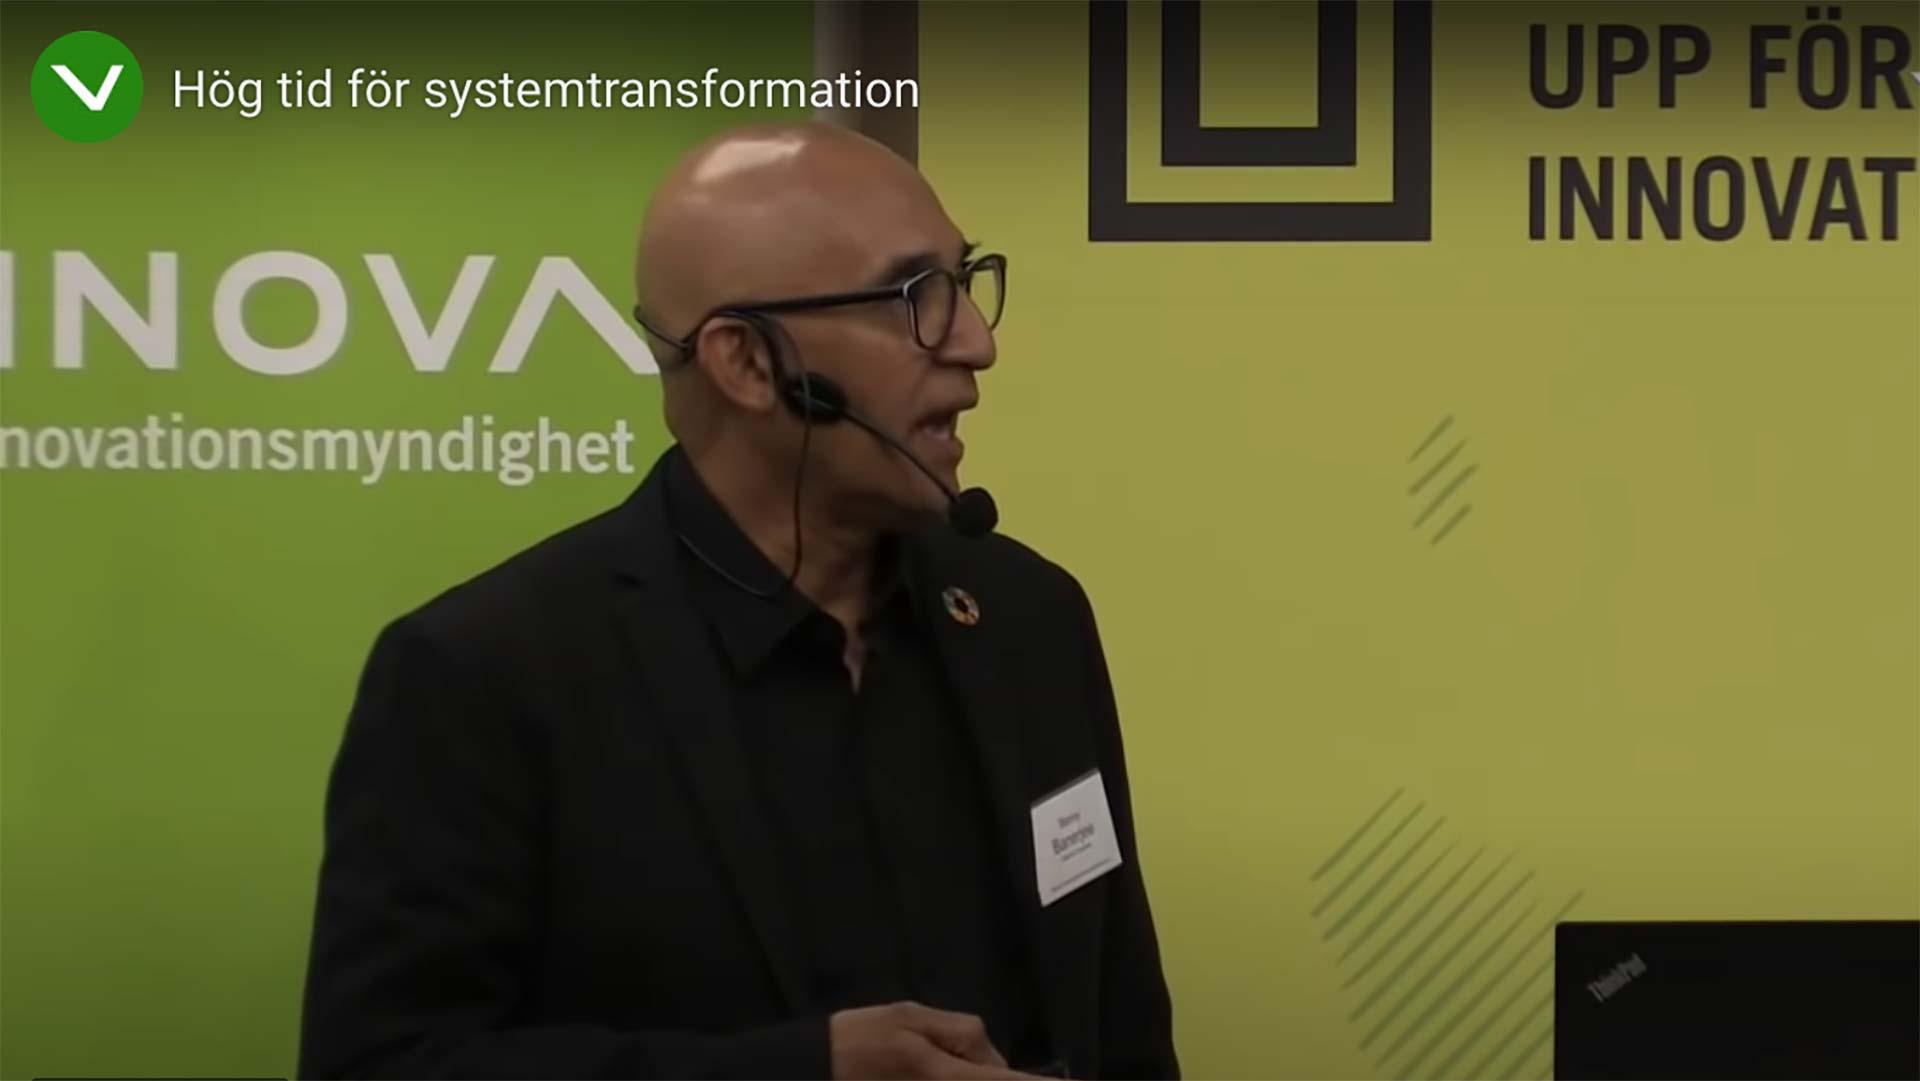 Hög tid för systemtransformation – Banny Banerjee, Director of Stanford Changeslabs